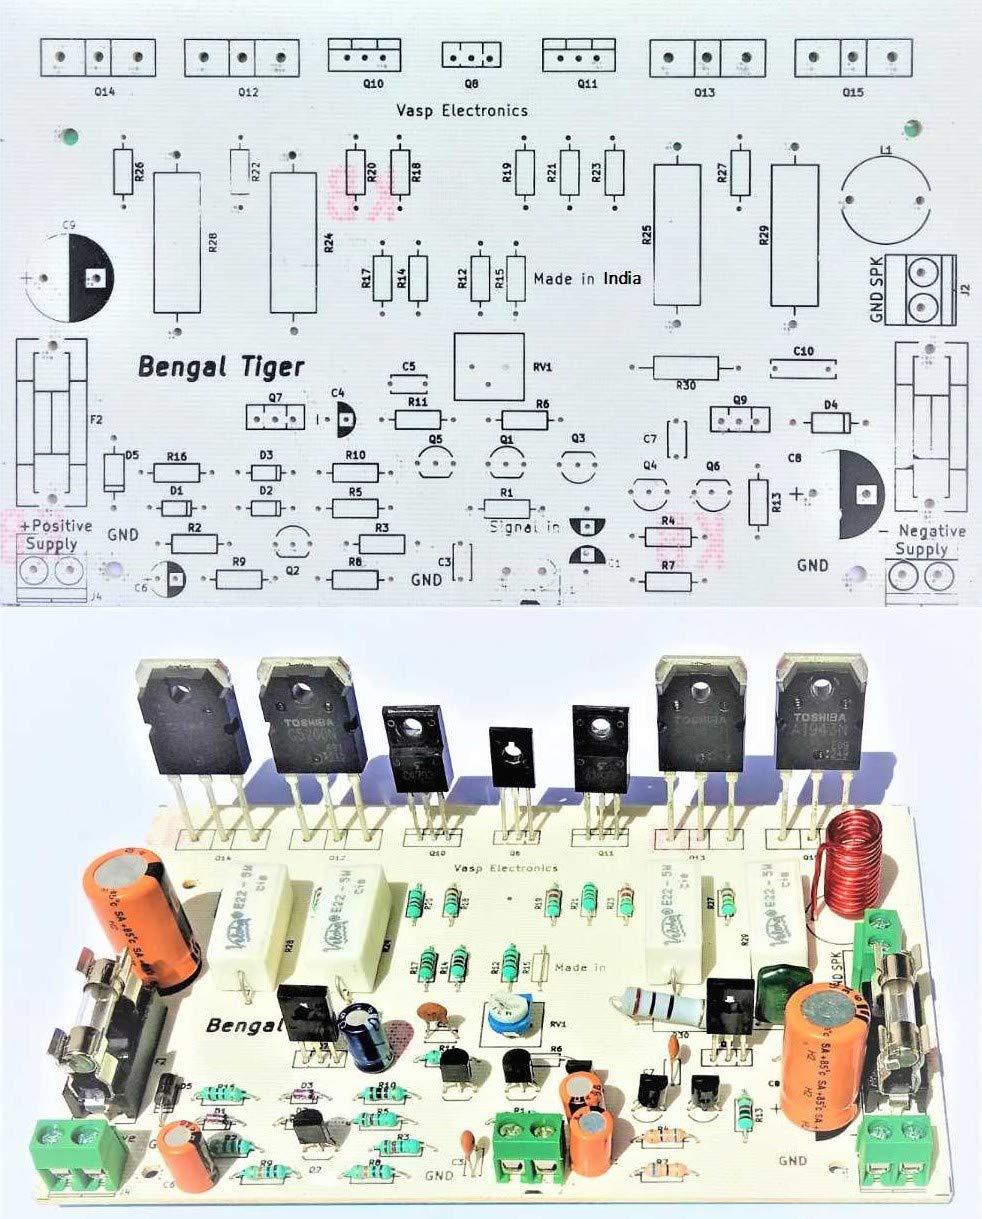 Vasp Electronics DIY - 250 Watt Audio Amplifier Board Using 2SC5200 2SA1943  Transistors Hobby Project - PCB Only - Pack of 2